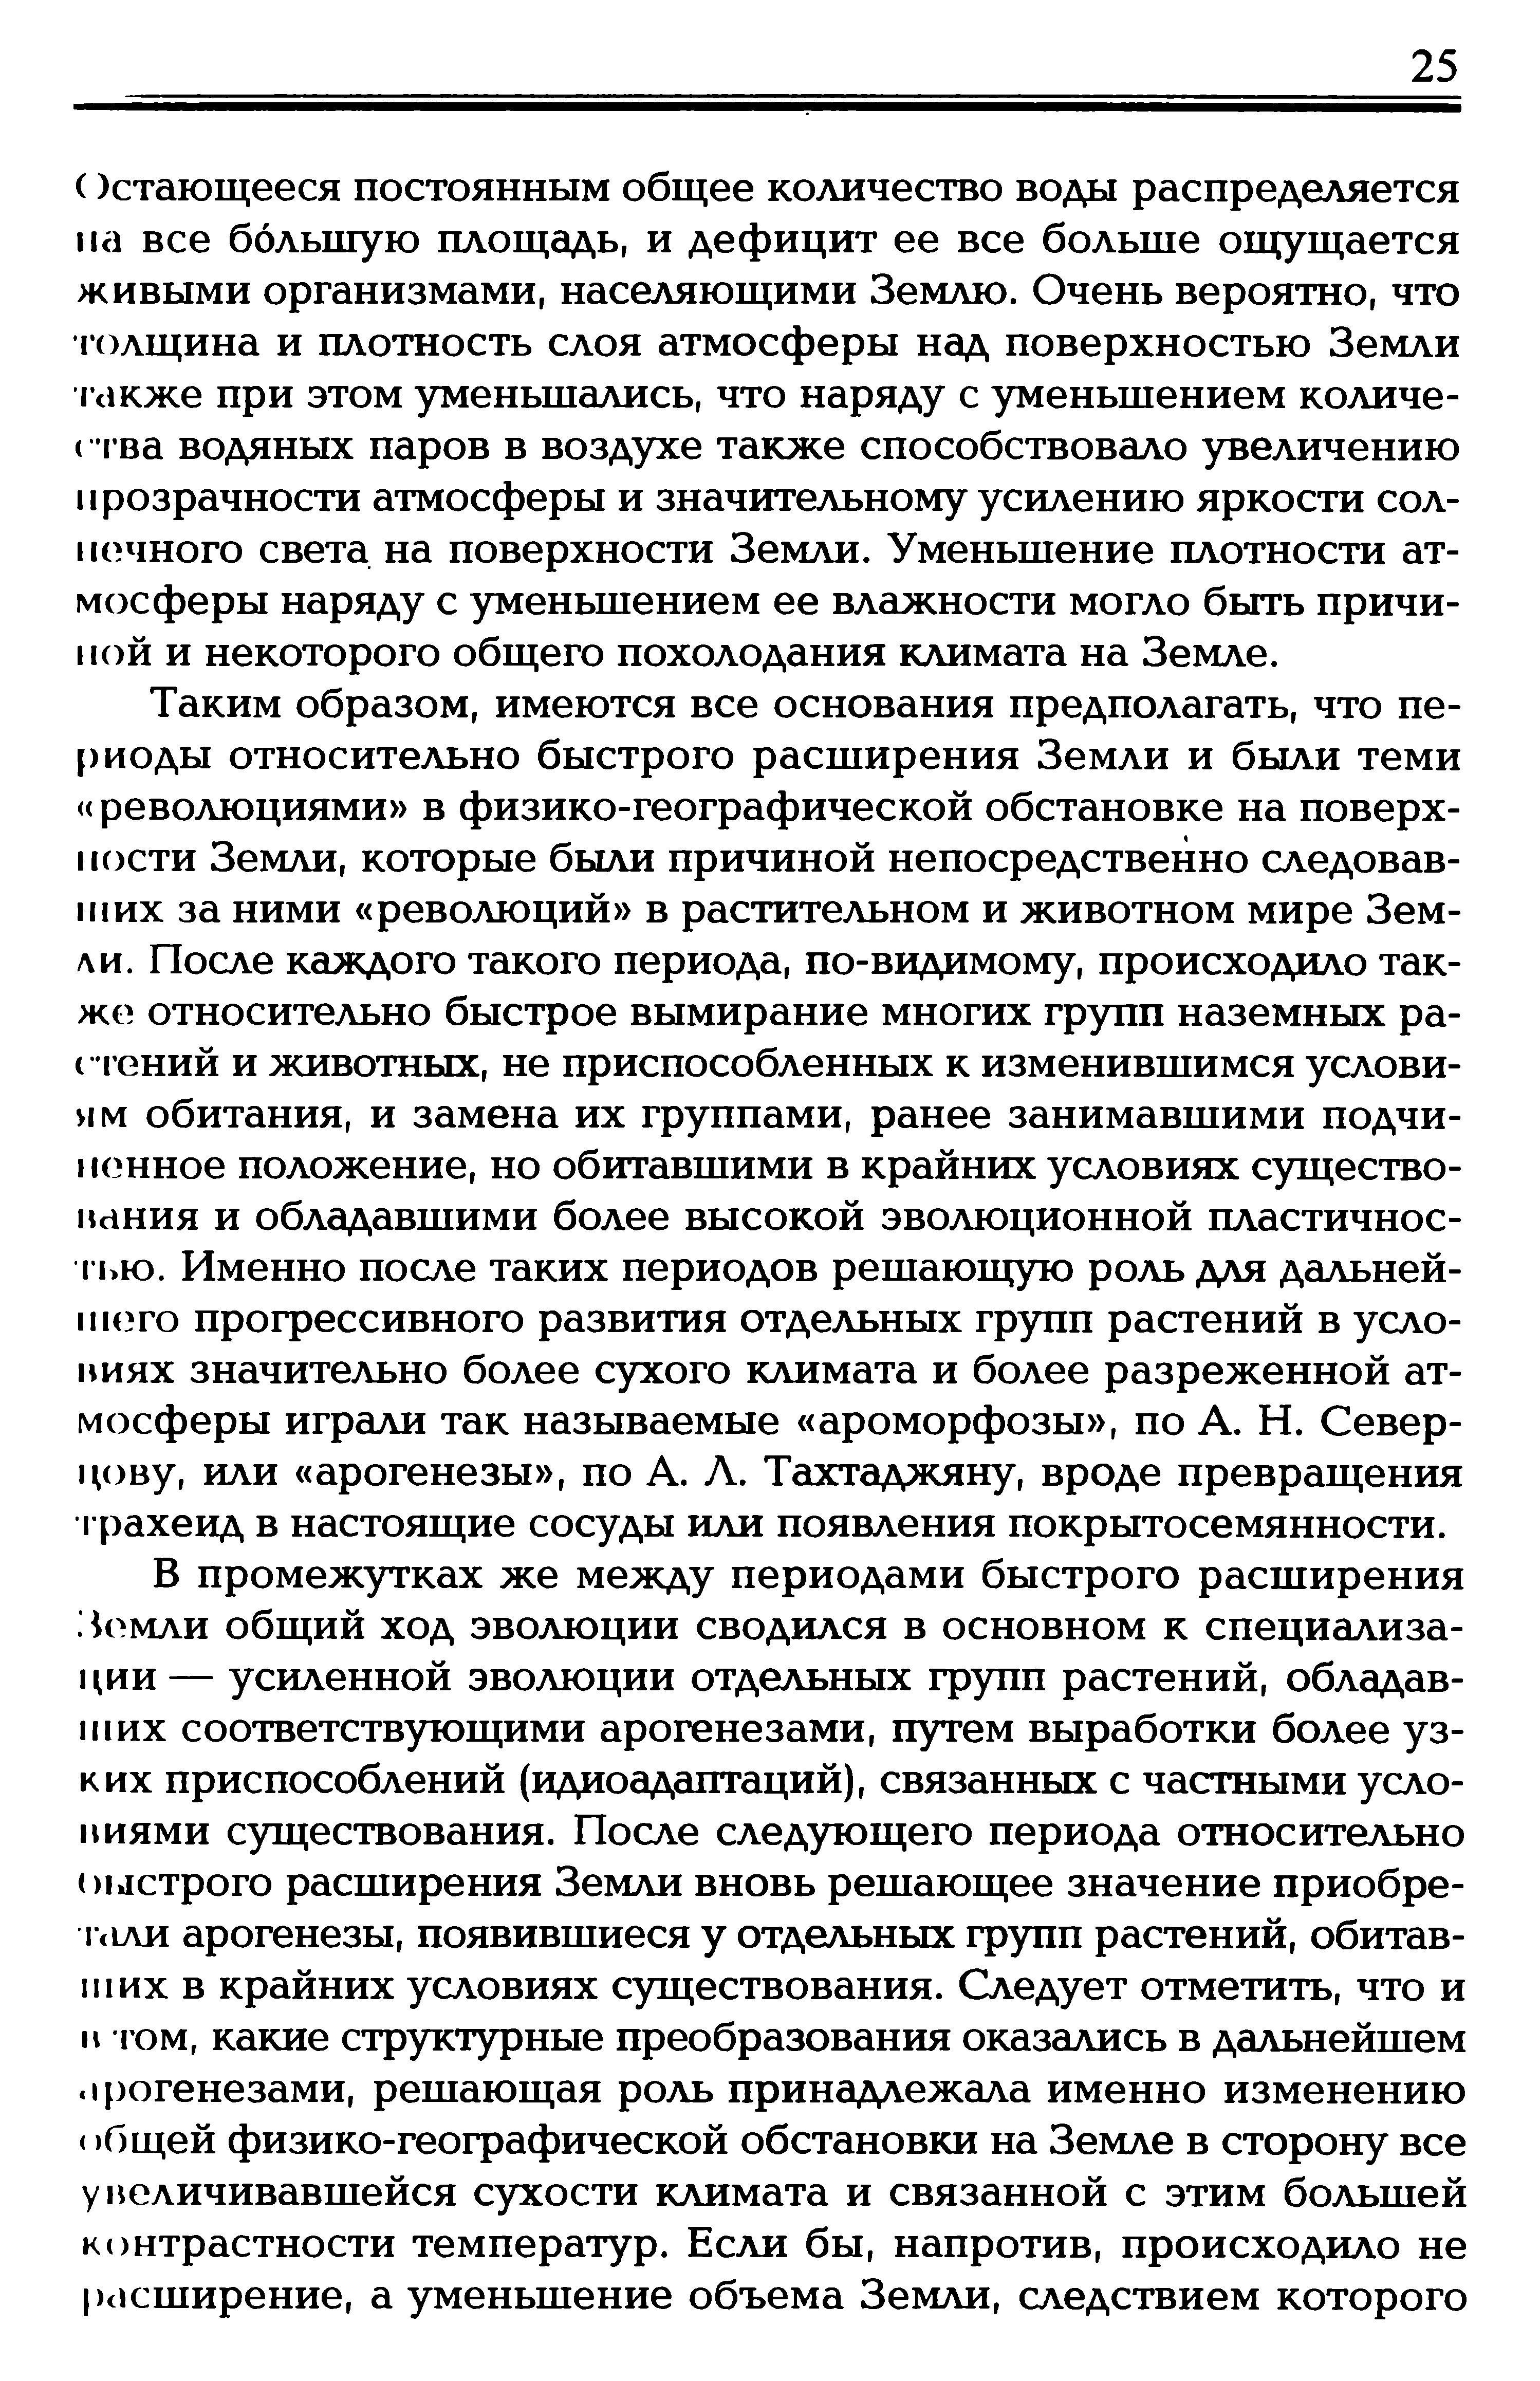 Tzvelev, 2005_1_06.jpeg